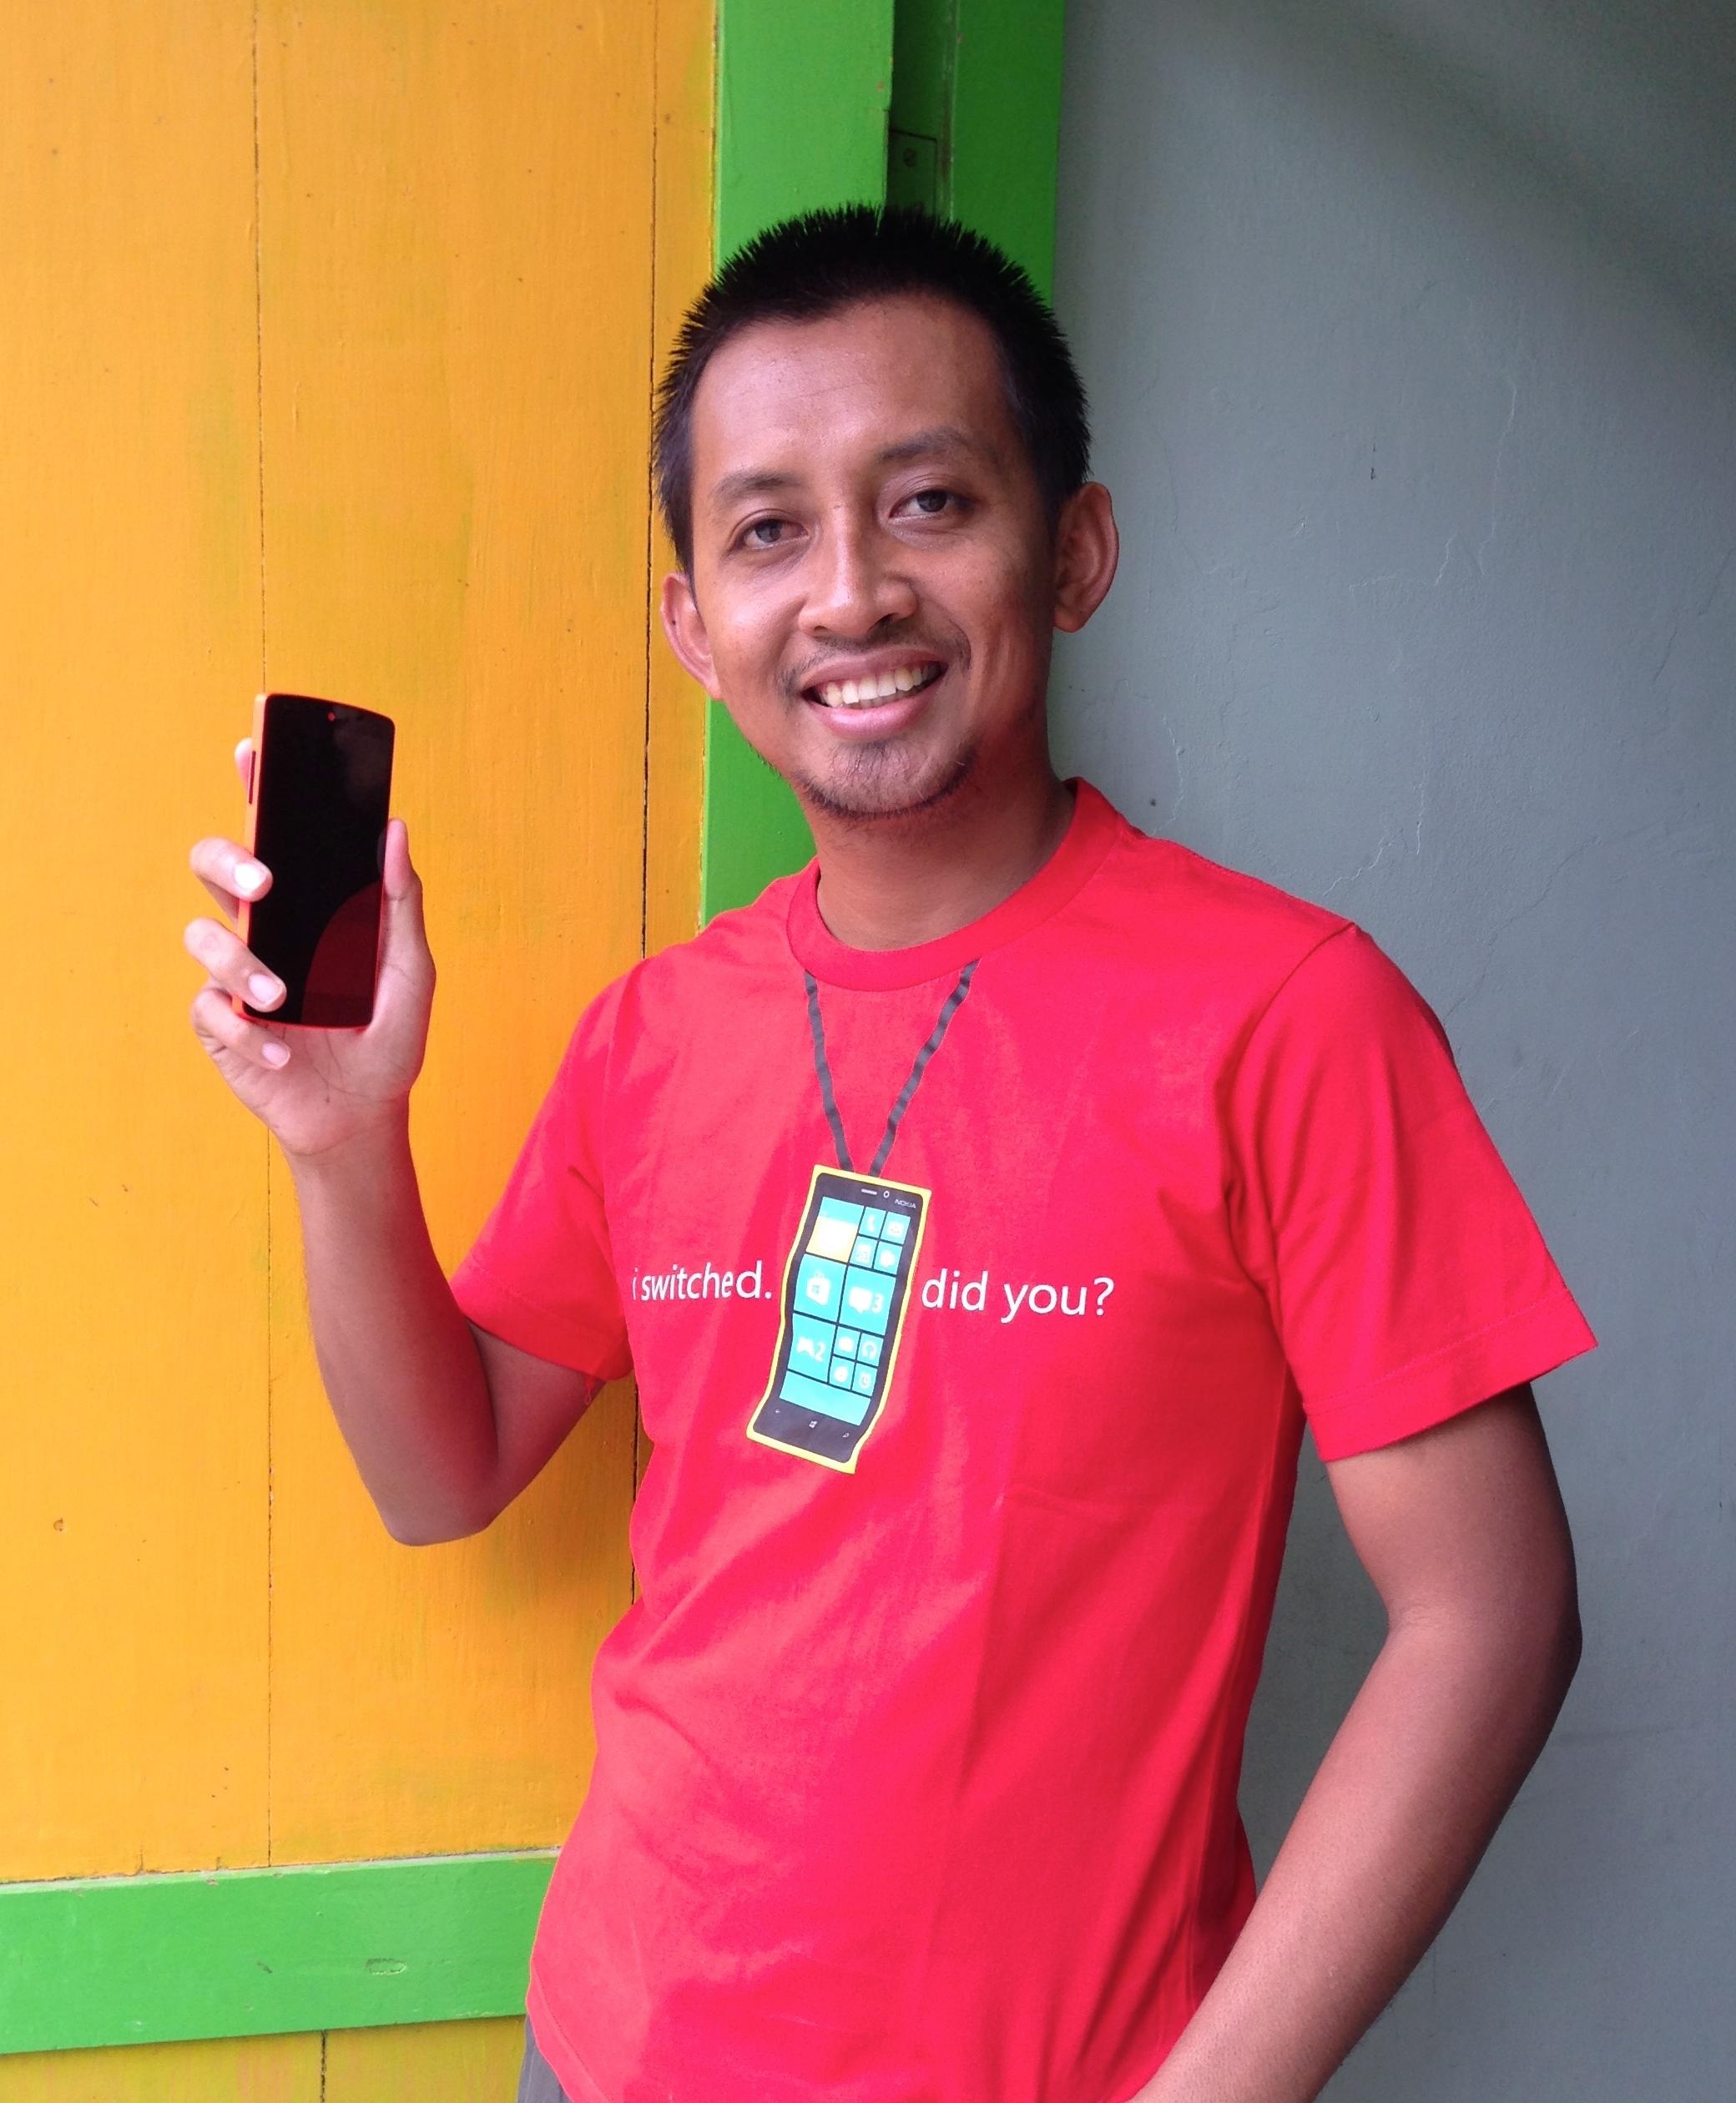 Foto bersama Nexus 5 RED Bright Kaos Windows Phone pengguna iPhone 5